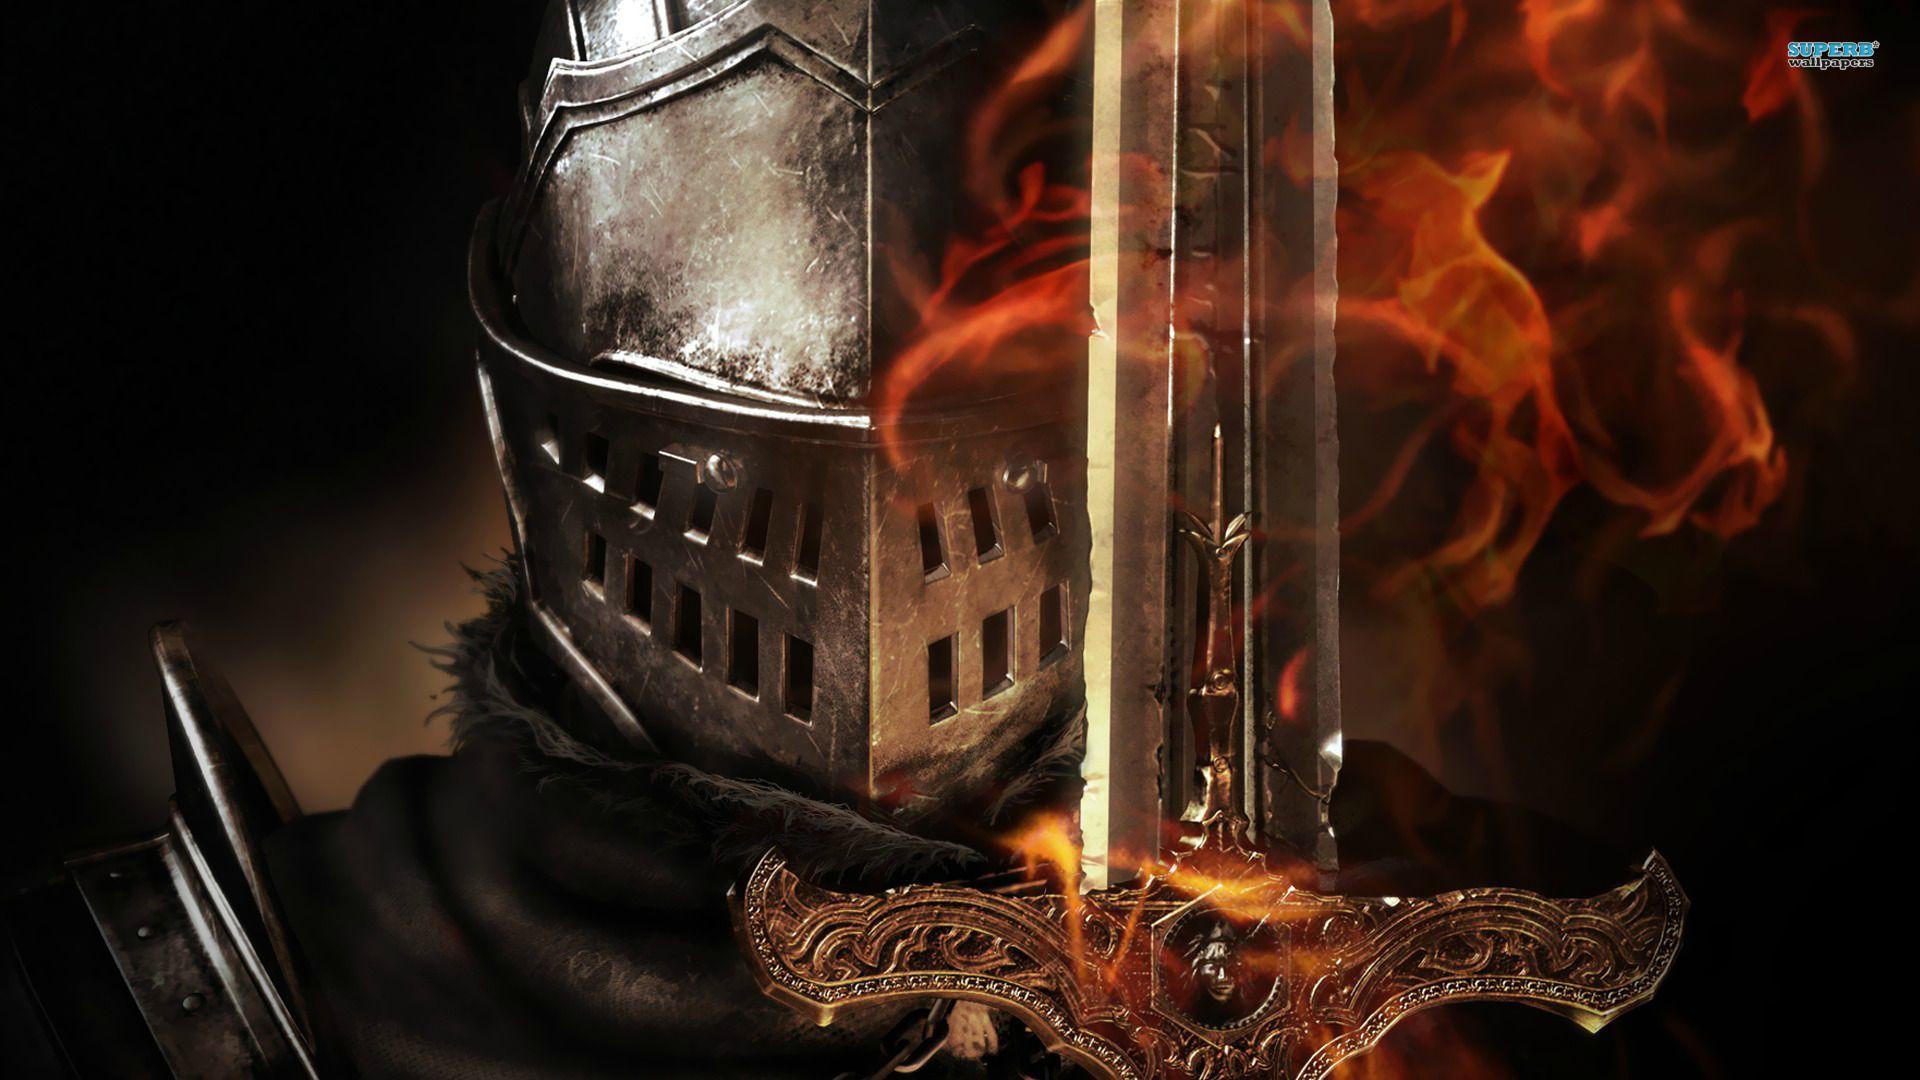 Dark Souls 2 Wallpaper 1080p Wallpaper